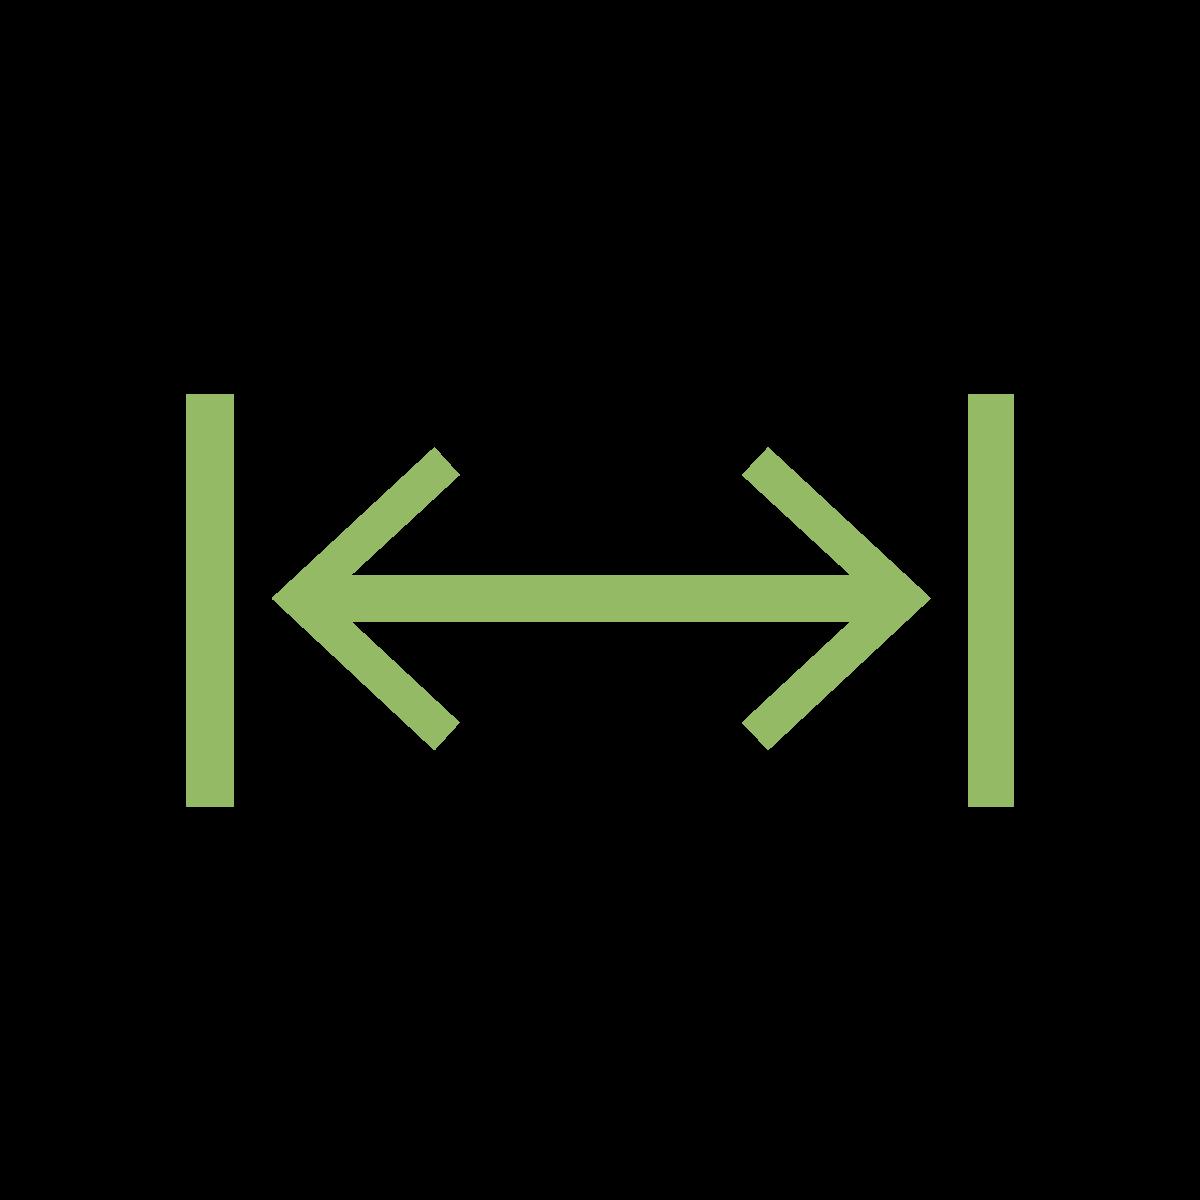 icon-length